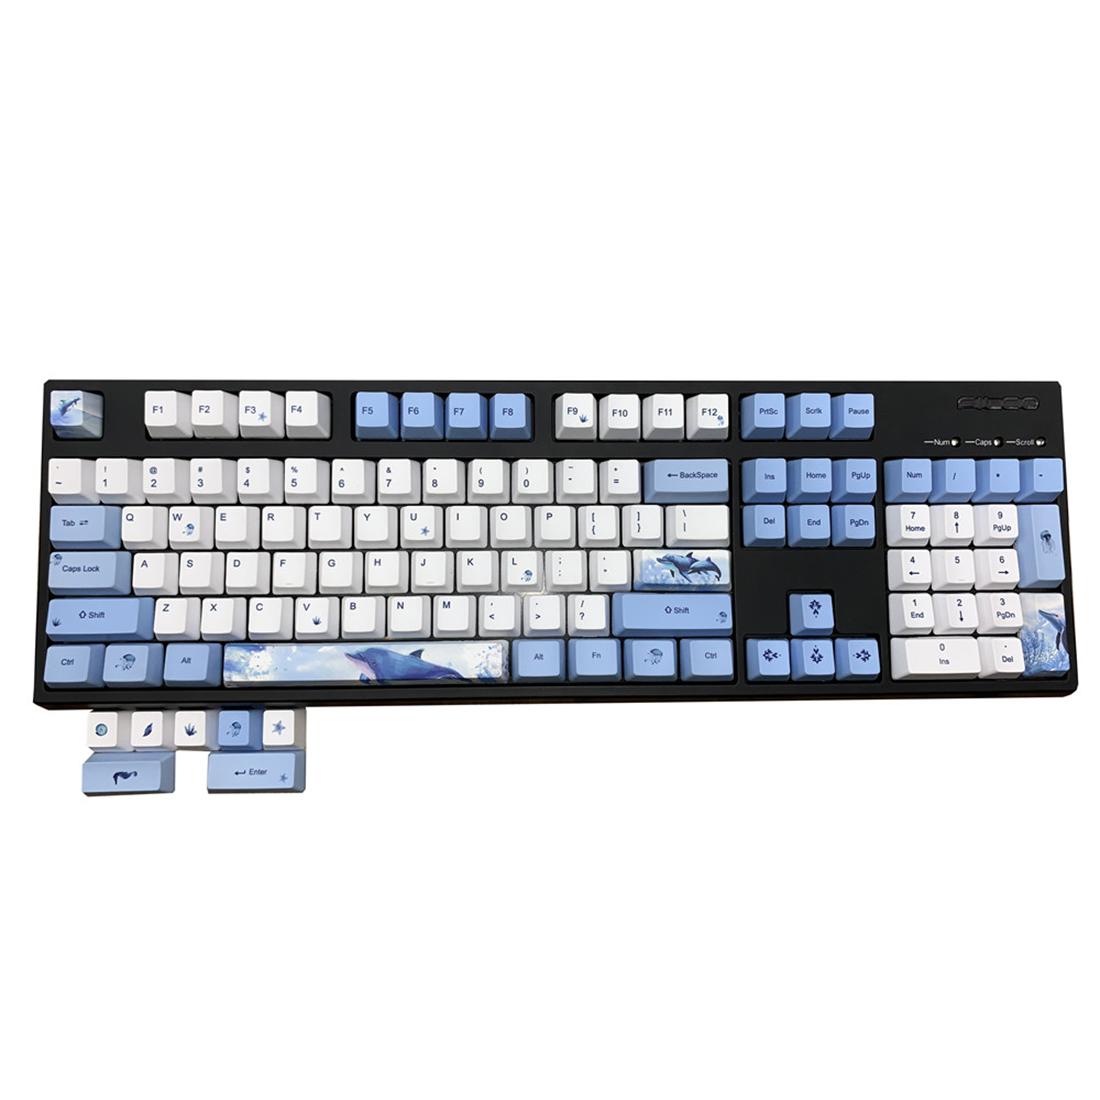 115pcs Blue Whale Keycaps Set OEM Profile PBT Dye-sub for Ajazz AKKO Keyboard